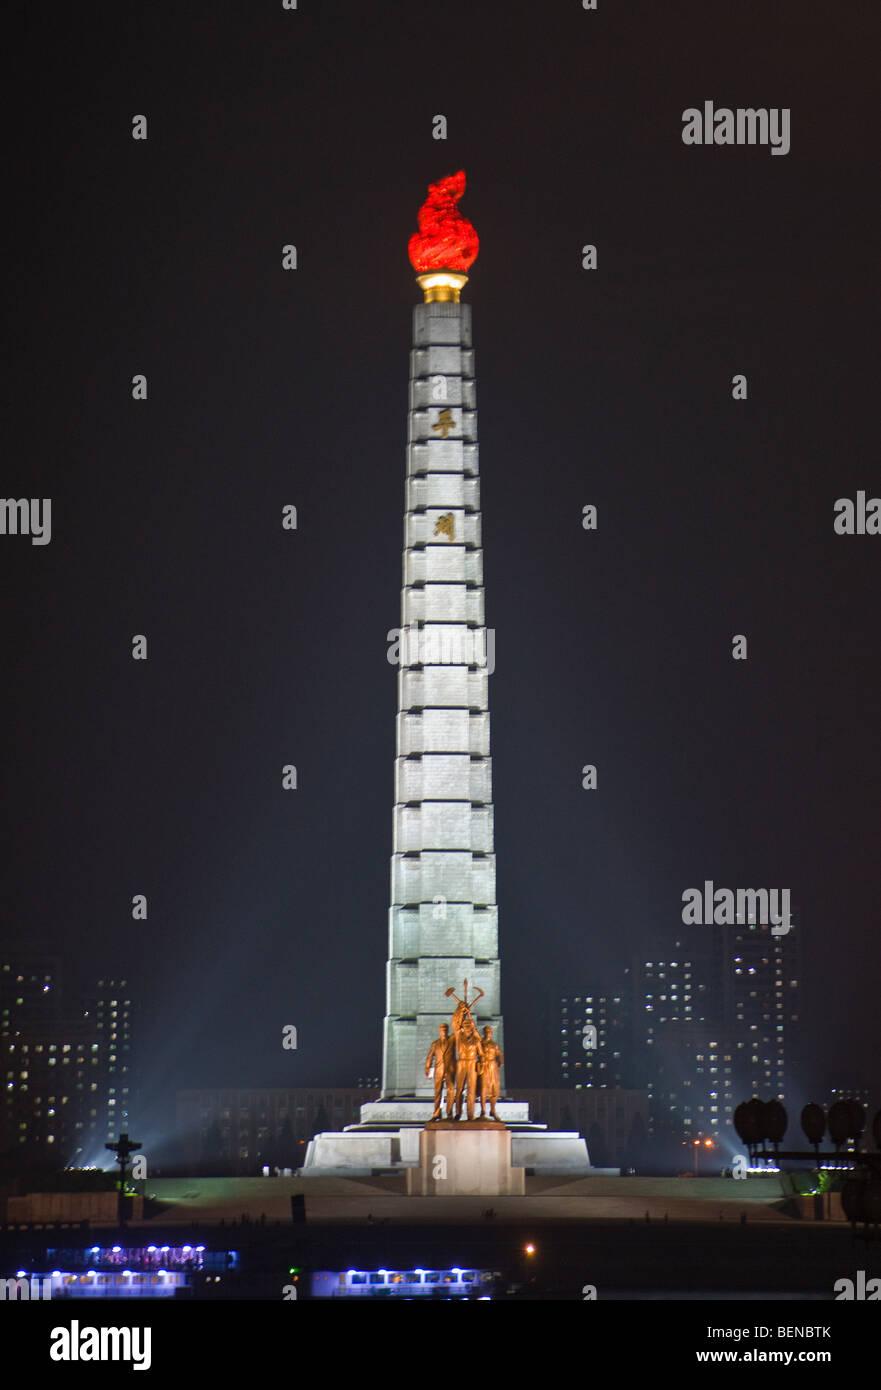 Tower of Juche Idea, night view, Pyongyang, North Korea - Stock Image